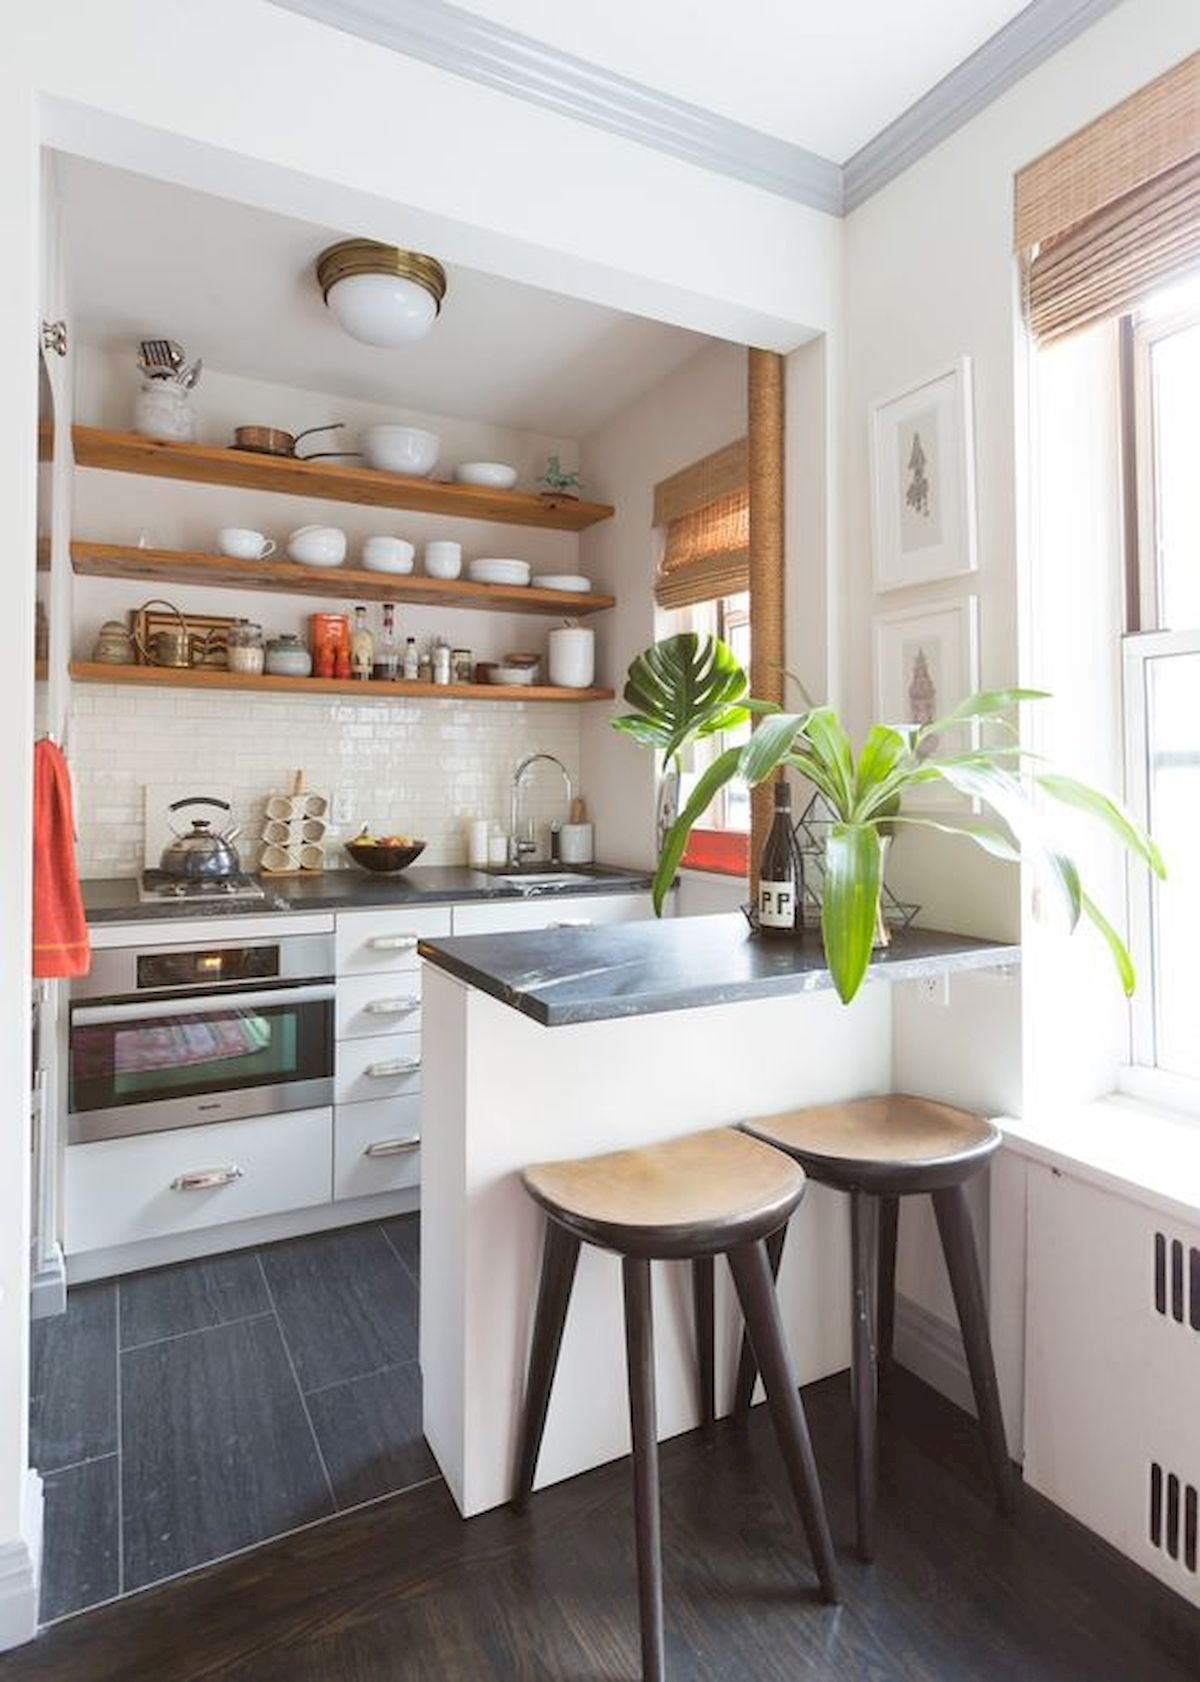 90 Beautiful Small Kitchen Design Ideas 19 Kitchen Design Small